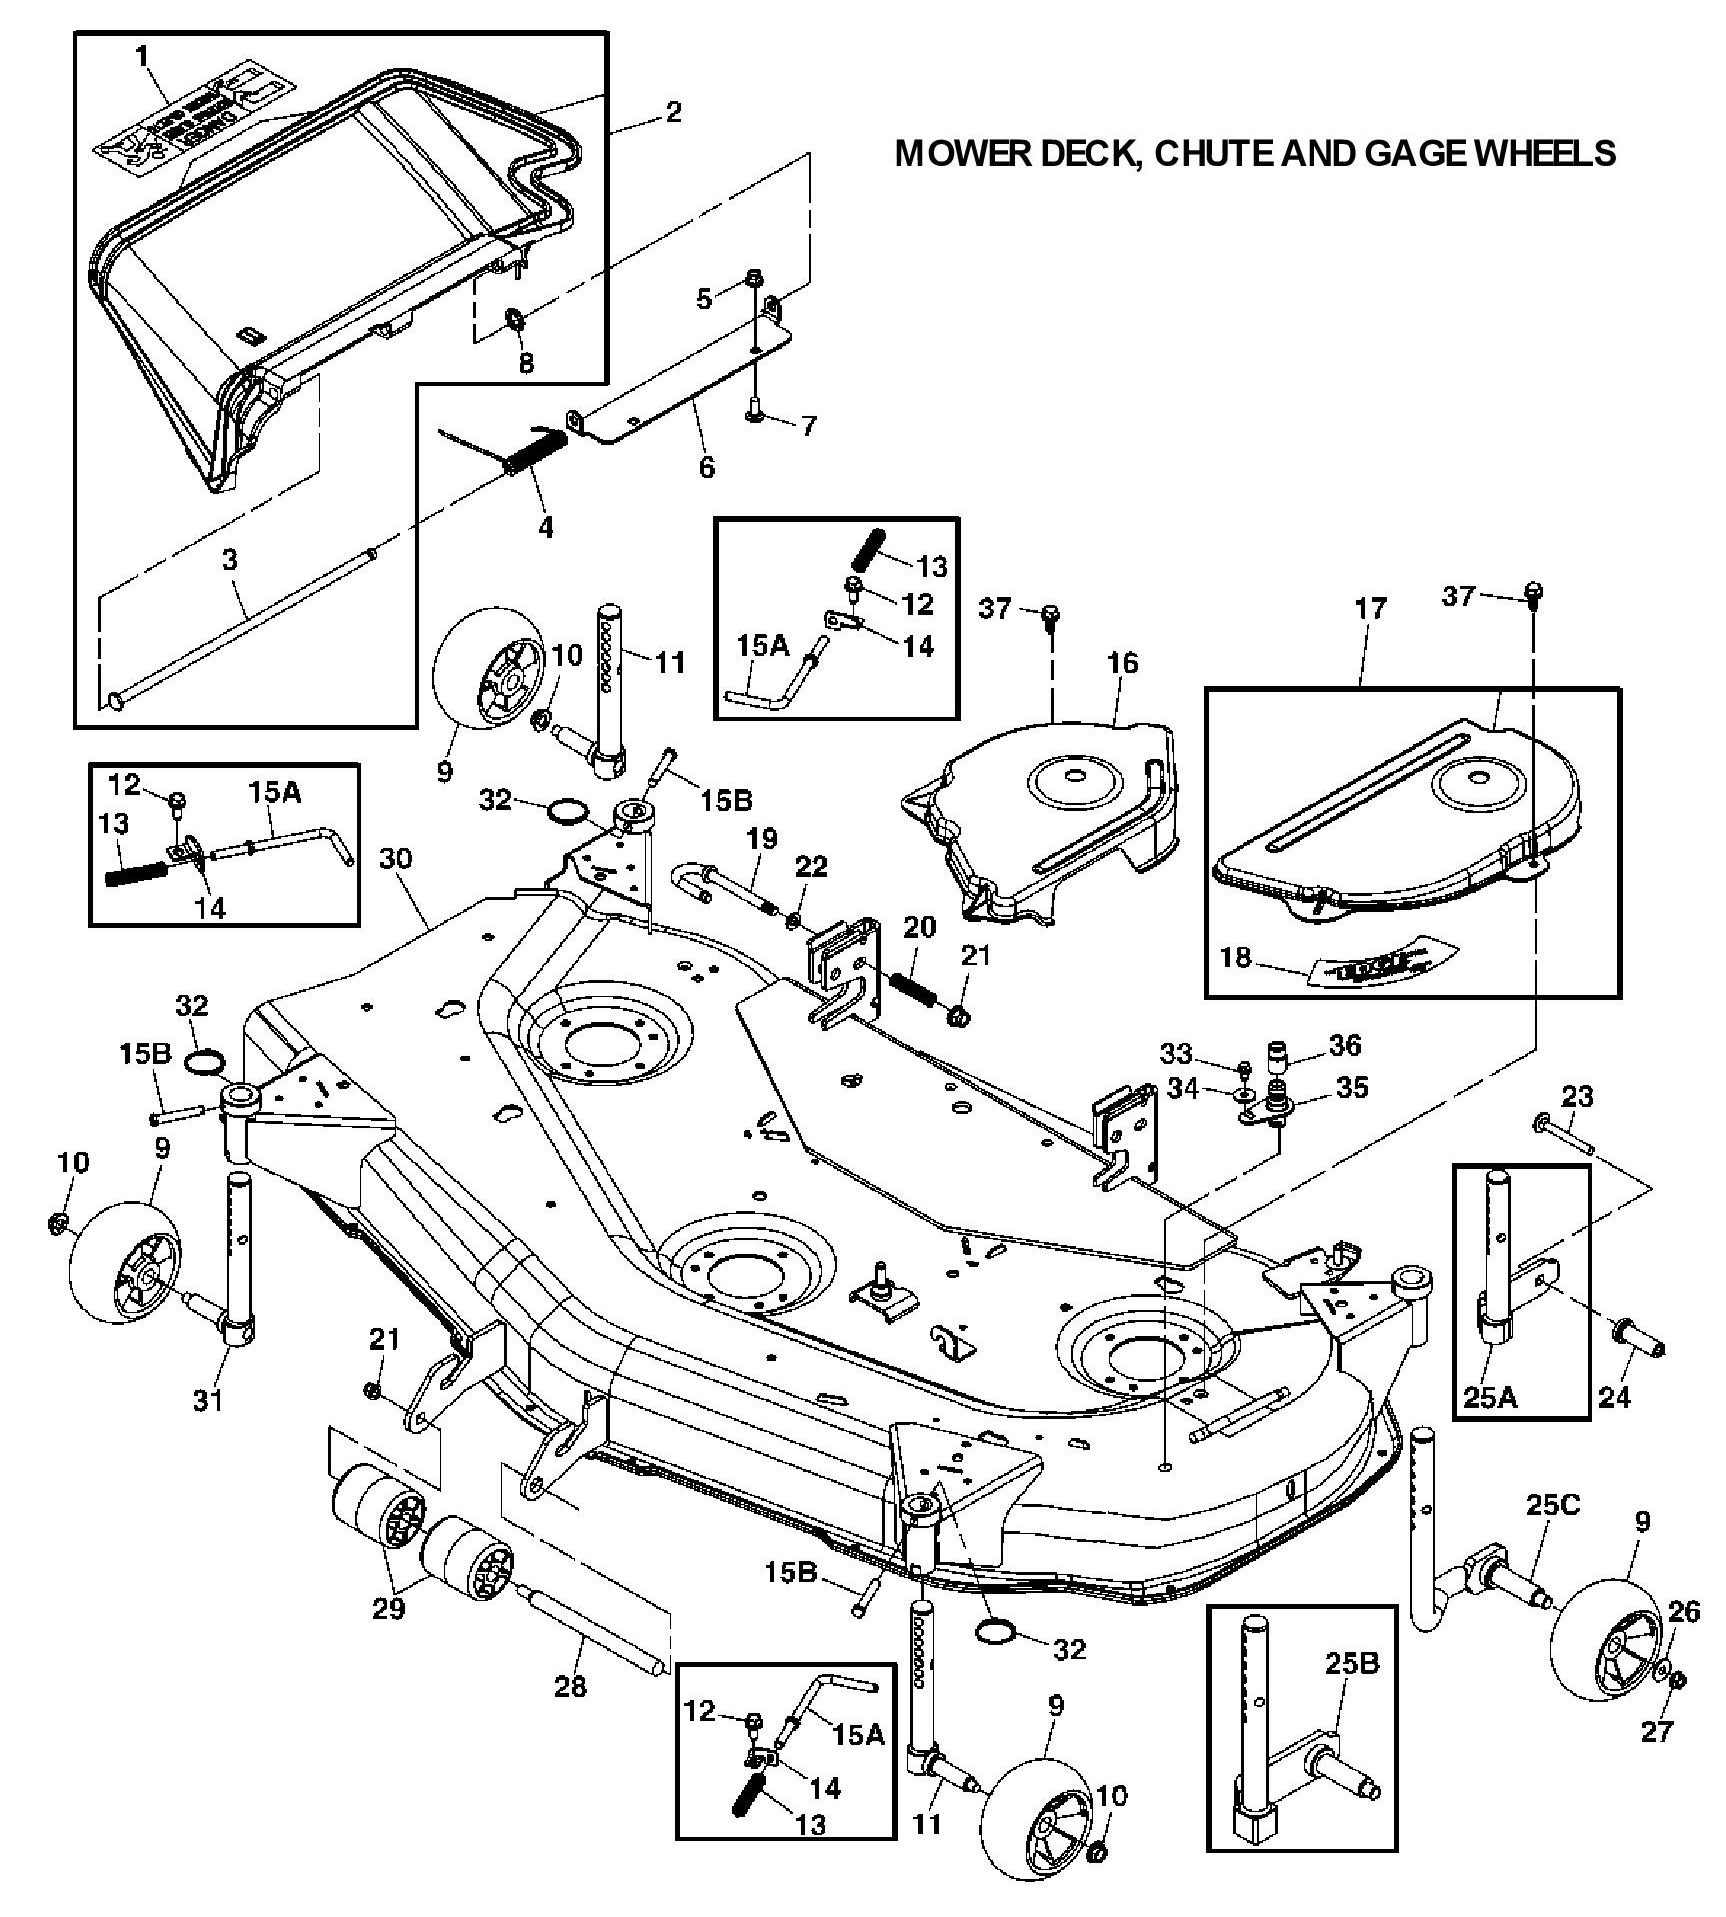 John Deere X320 Deck Parts